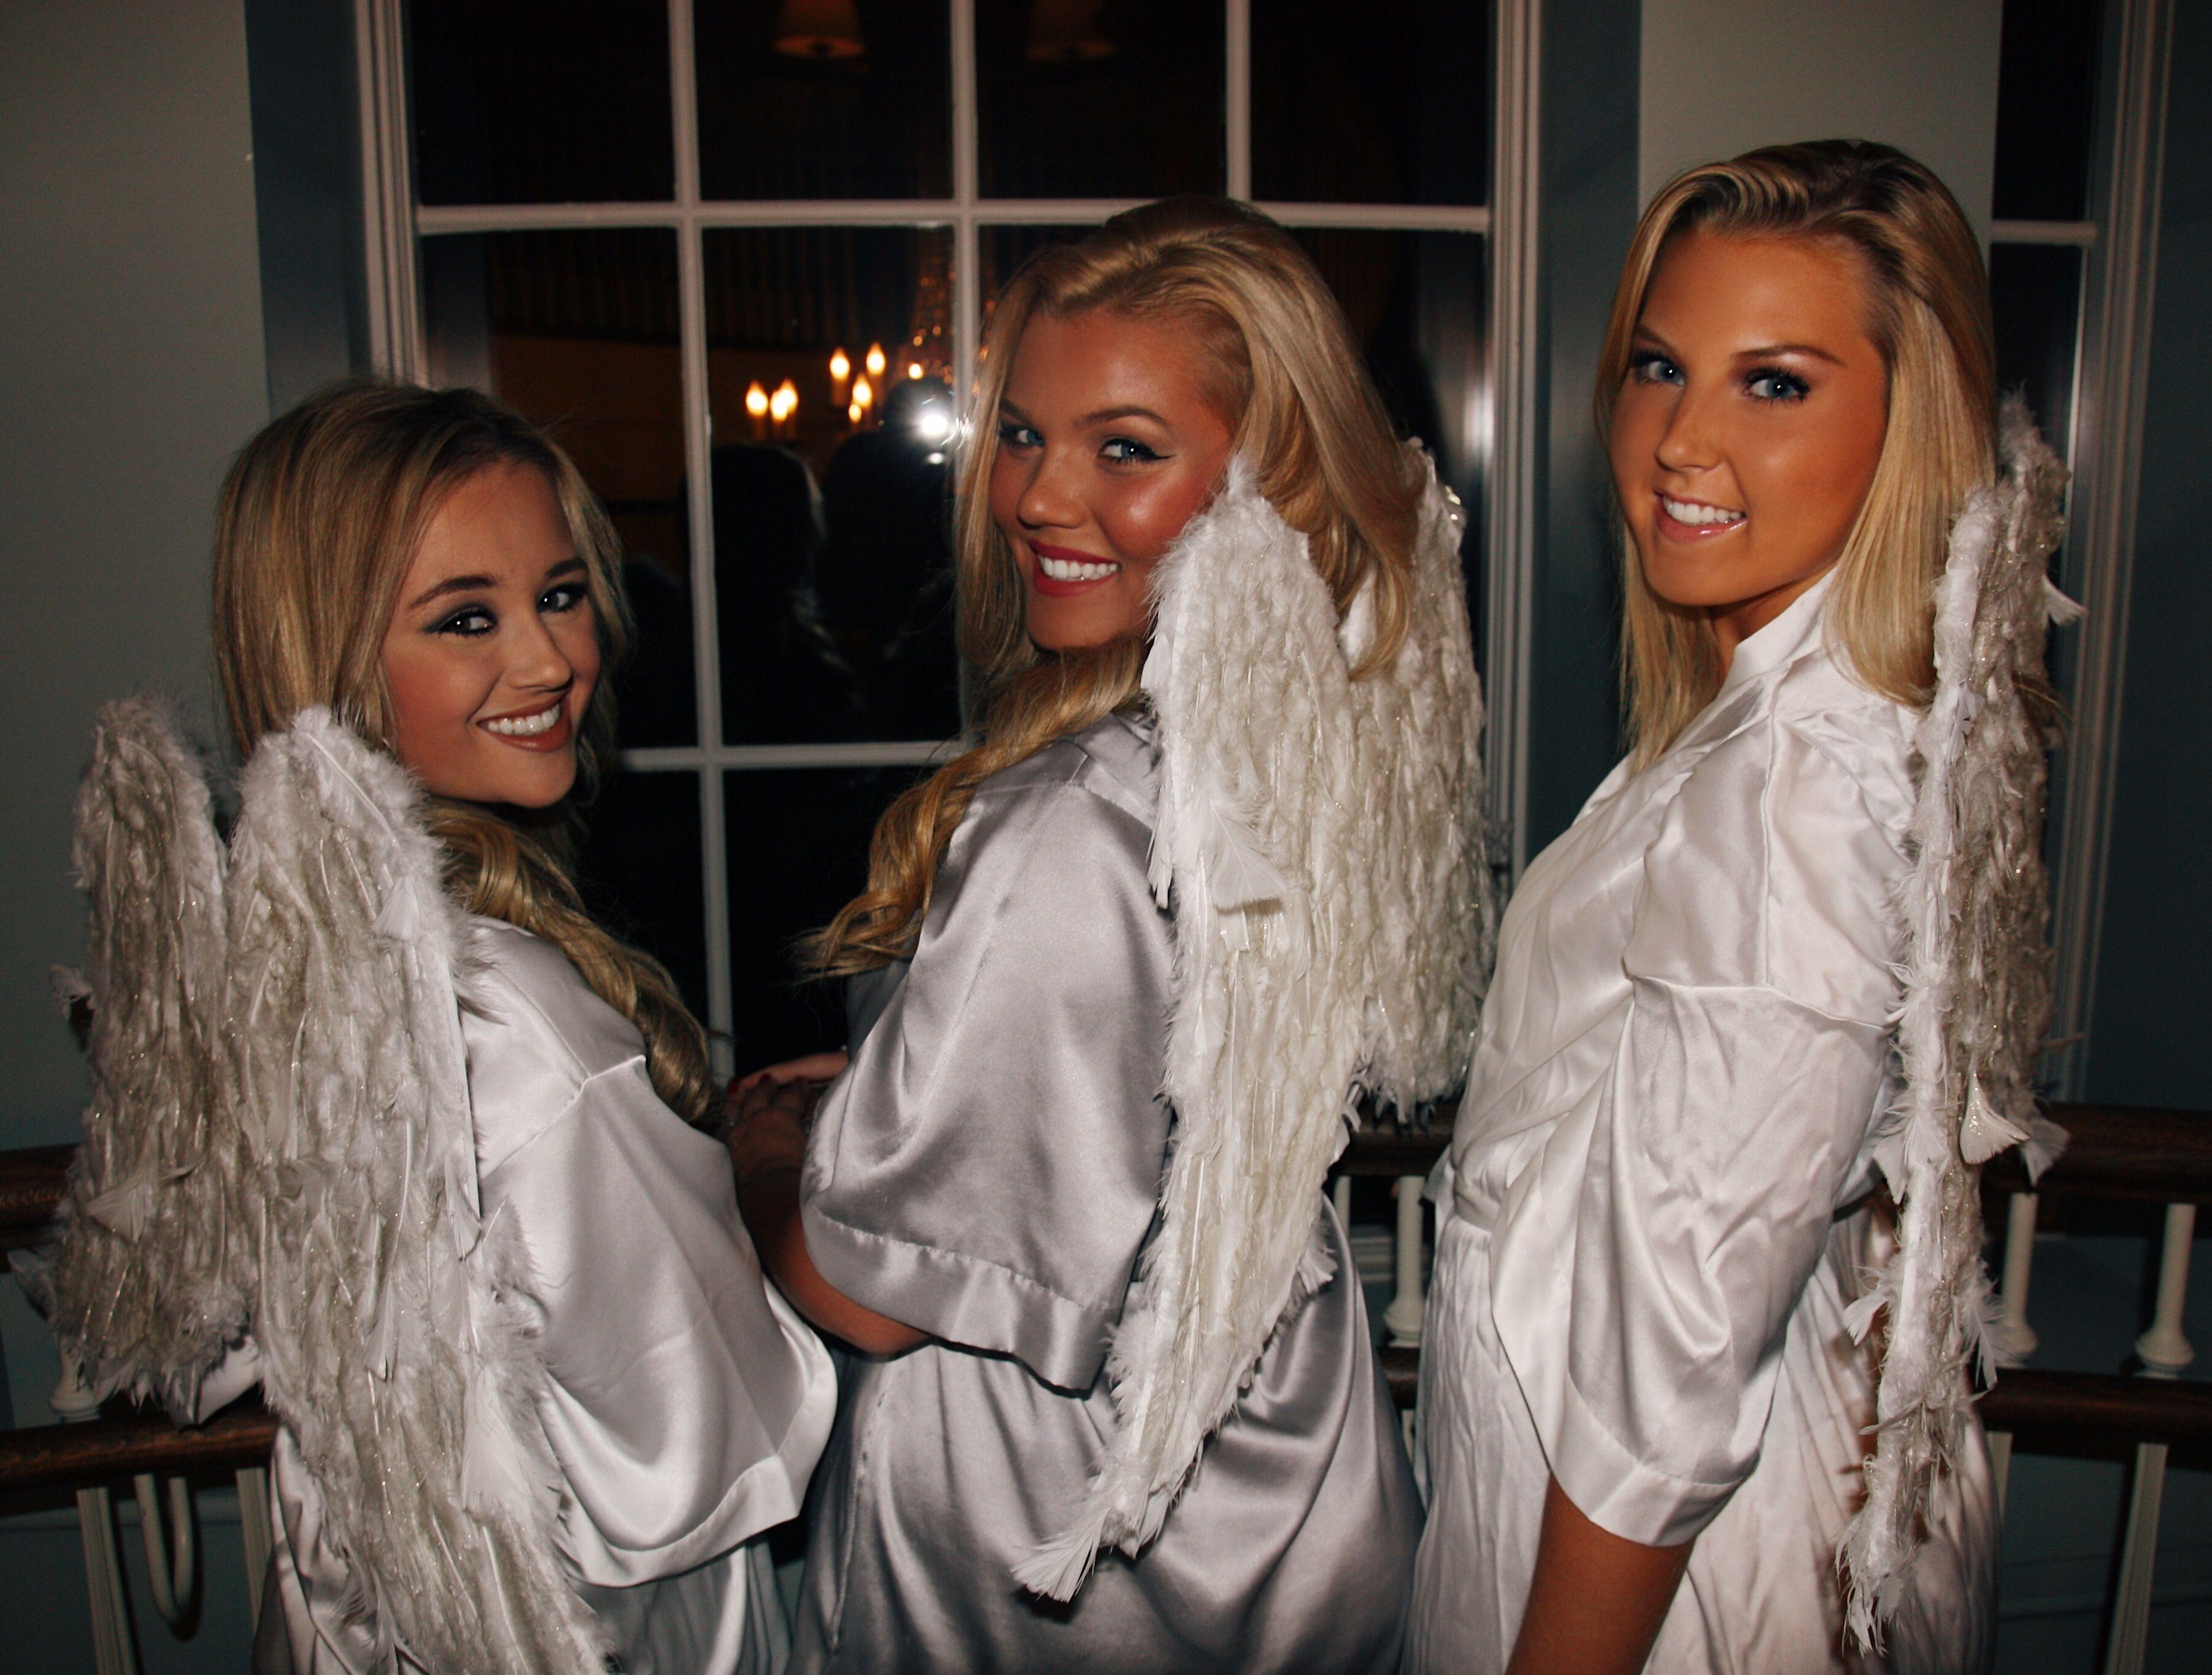 Big Little Reveal Idea, Victoria Secret Angels! #biglittlereveal